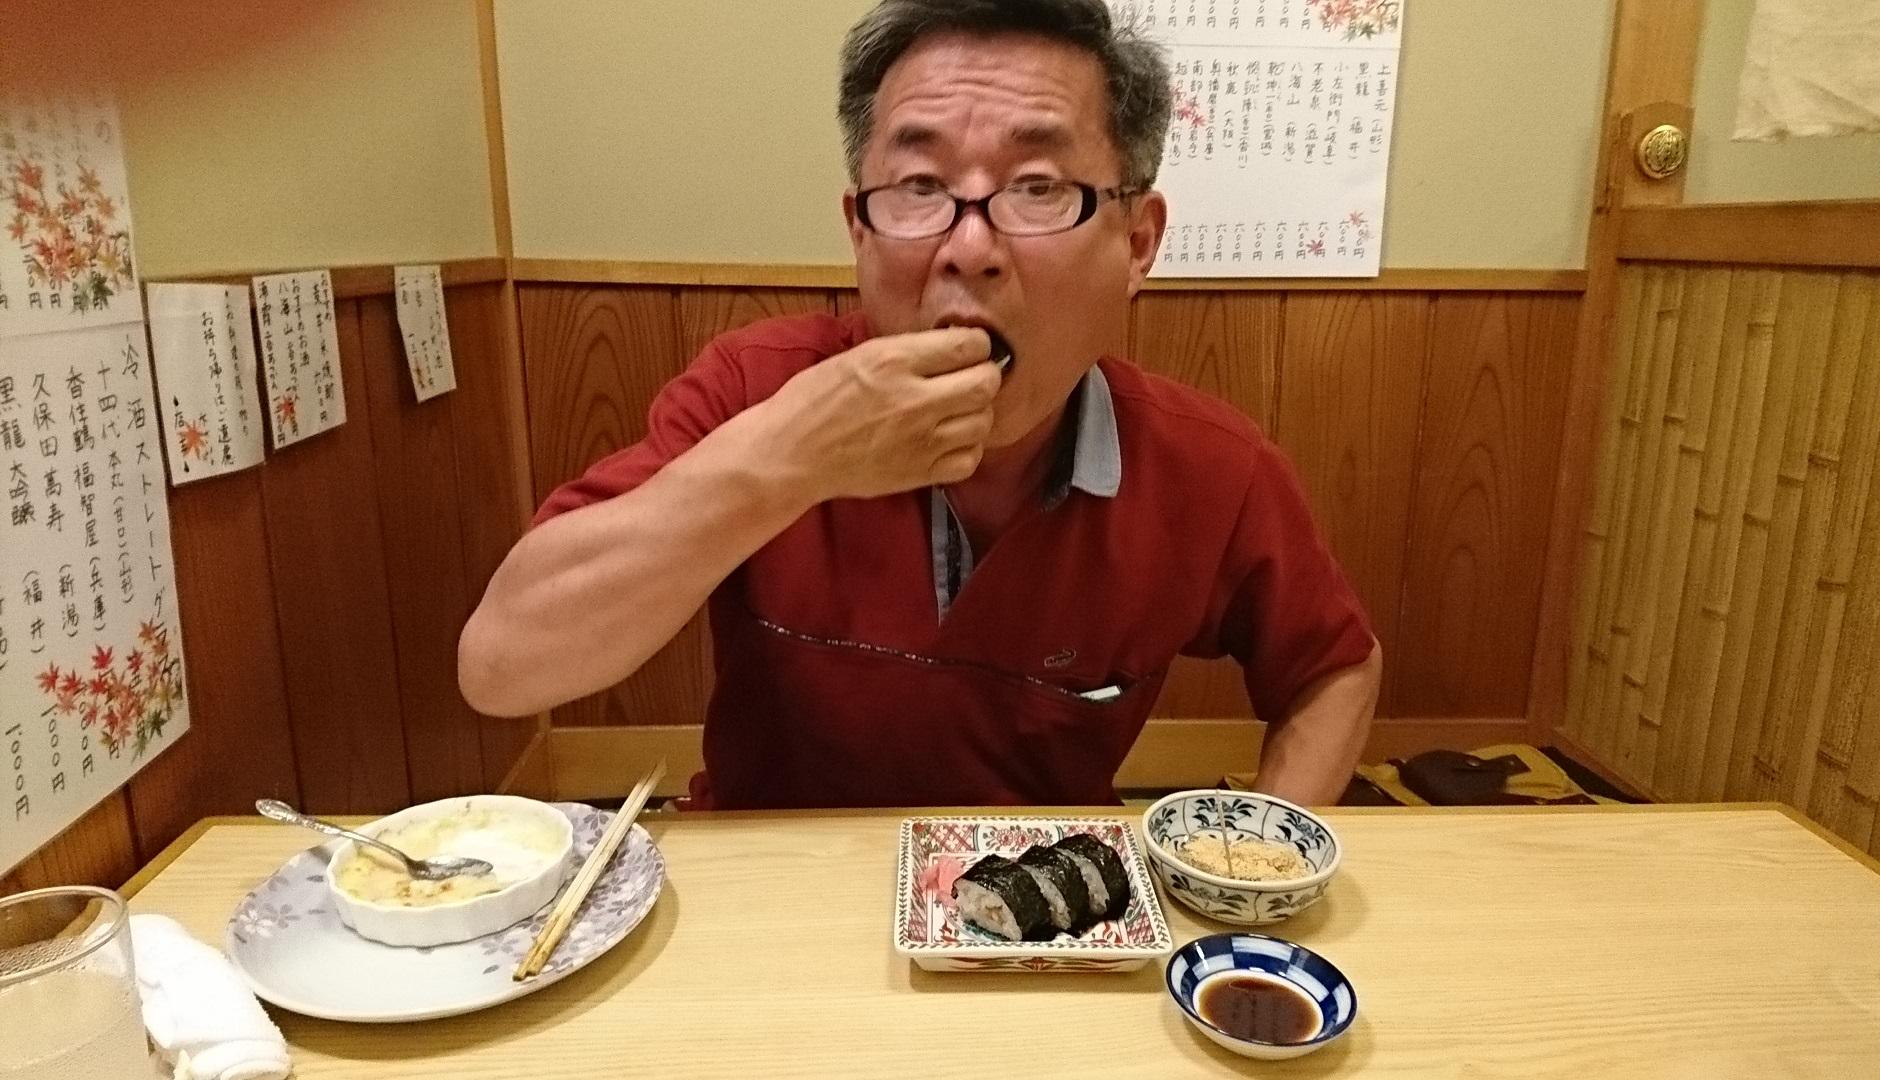 2017.6.3 豊岡 (114) 紀ノ川 1880-1080